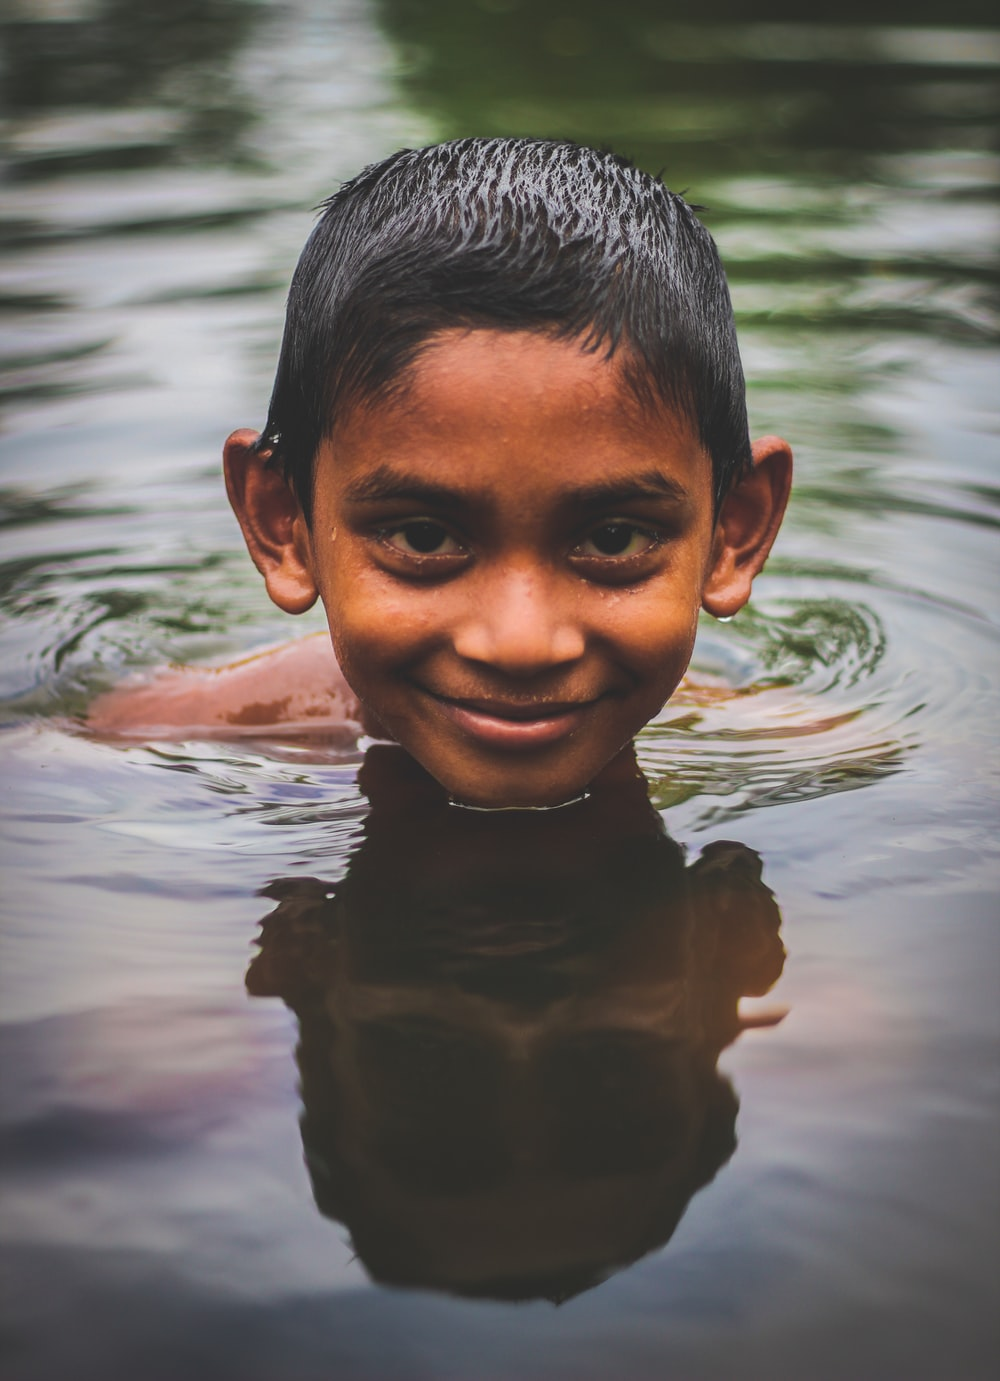 boy in water during daytime